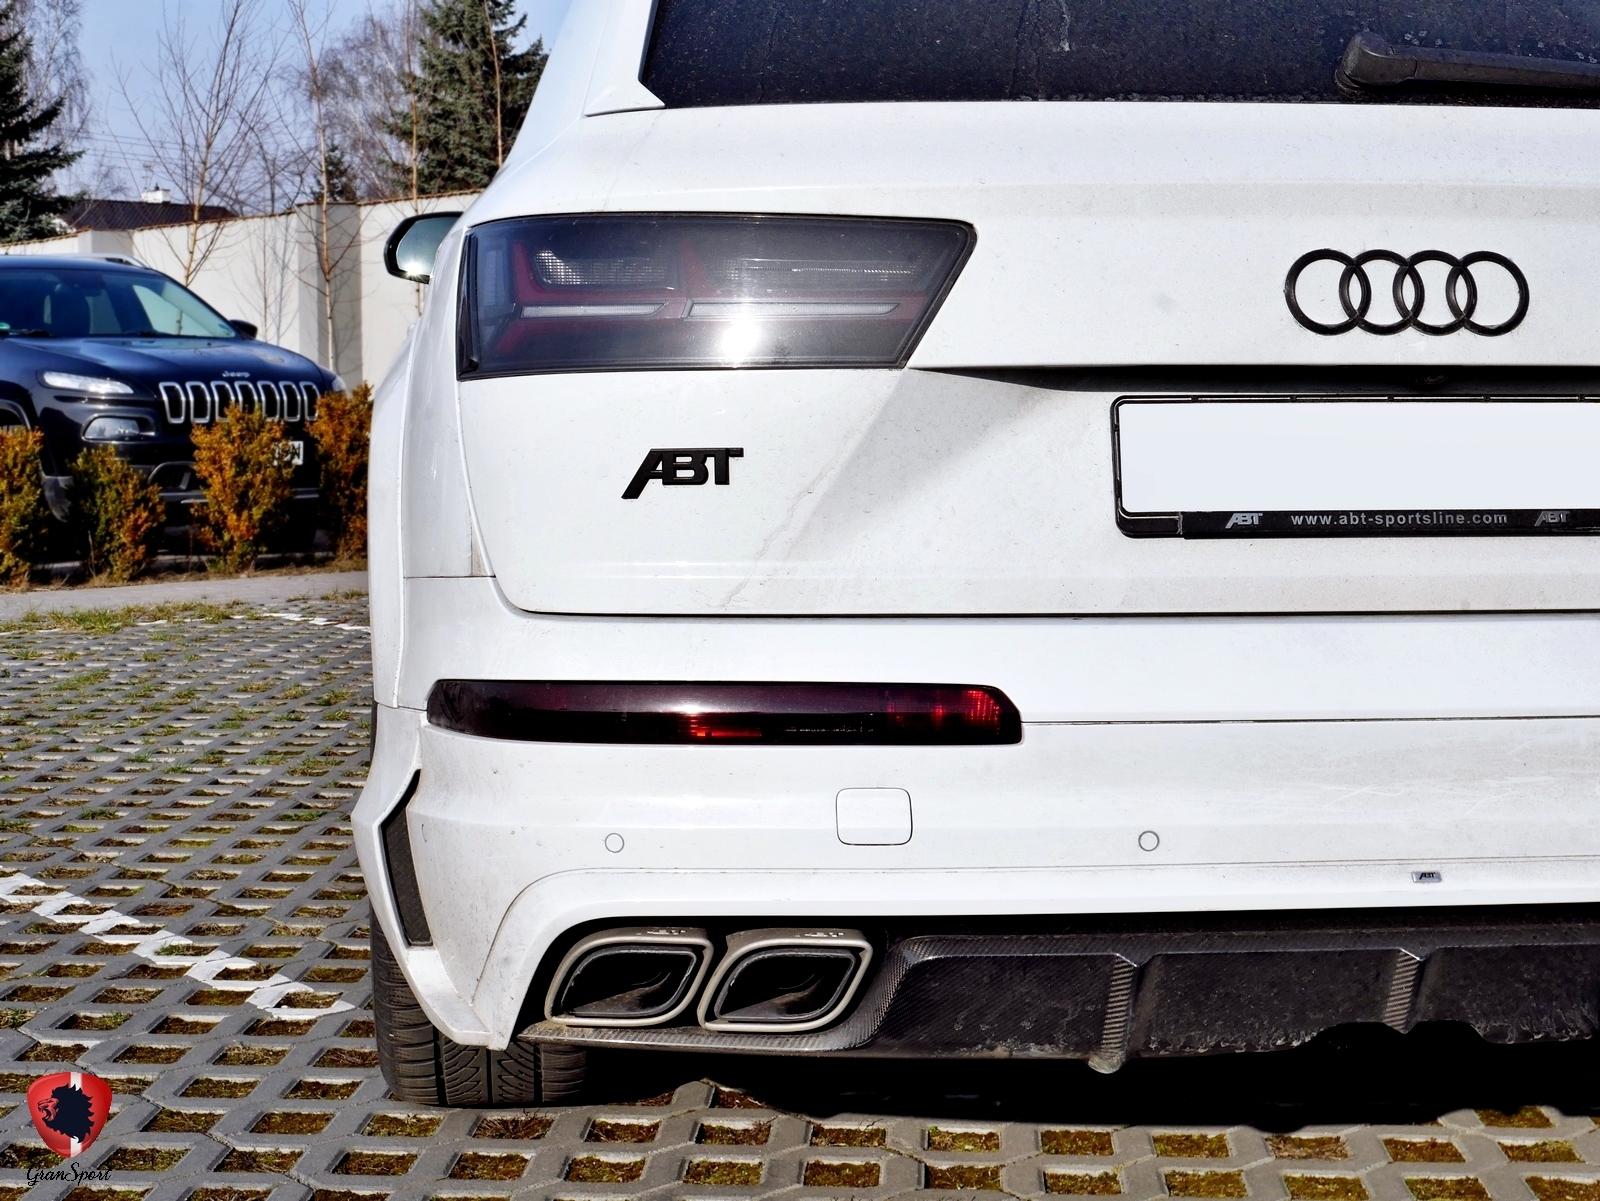 ABT SQ7 Maxhaust